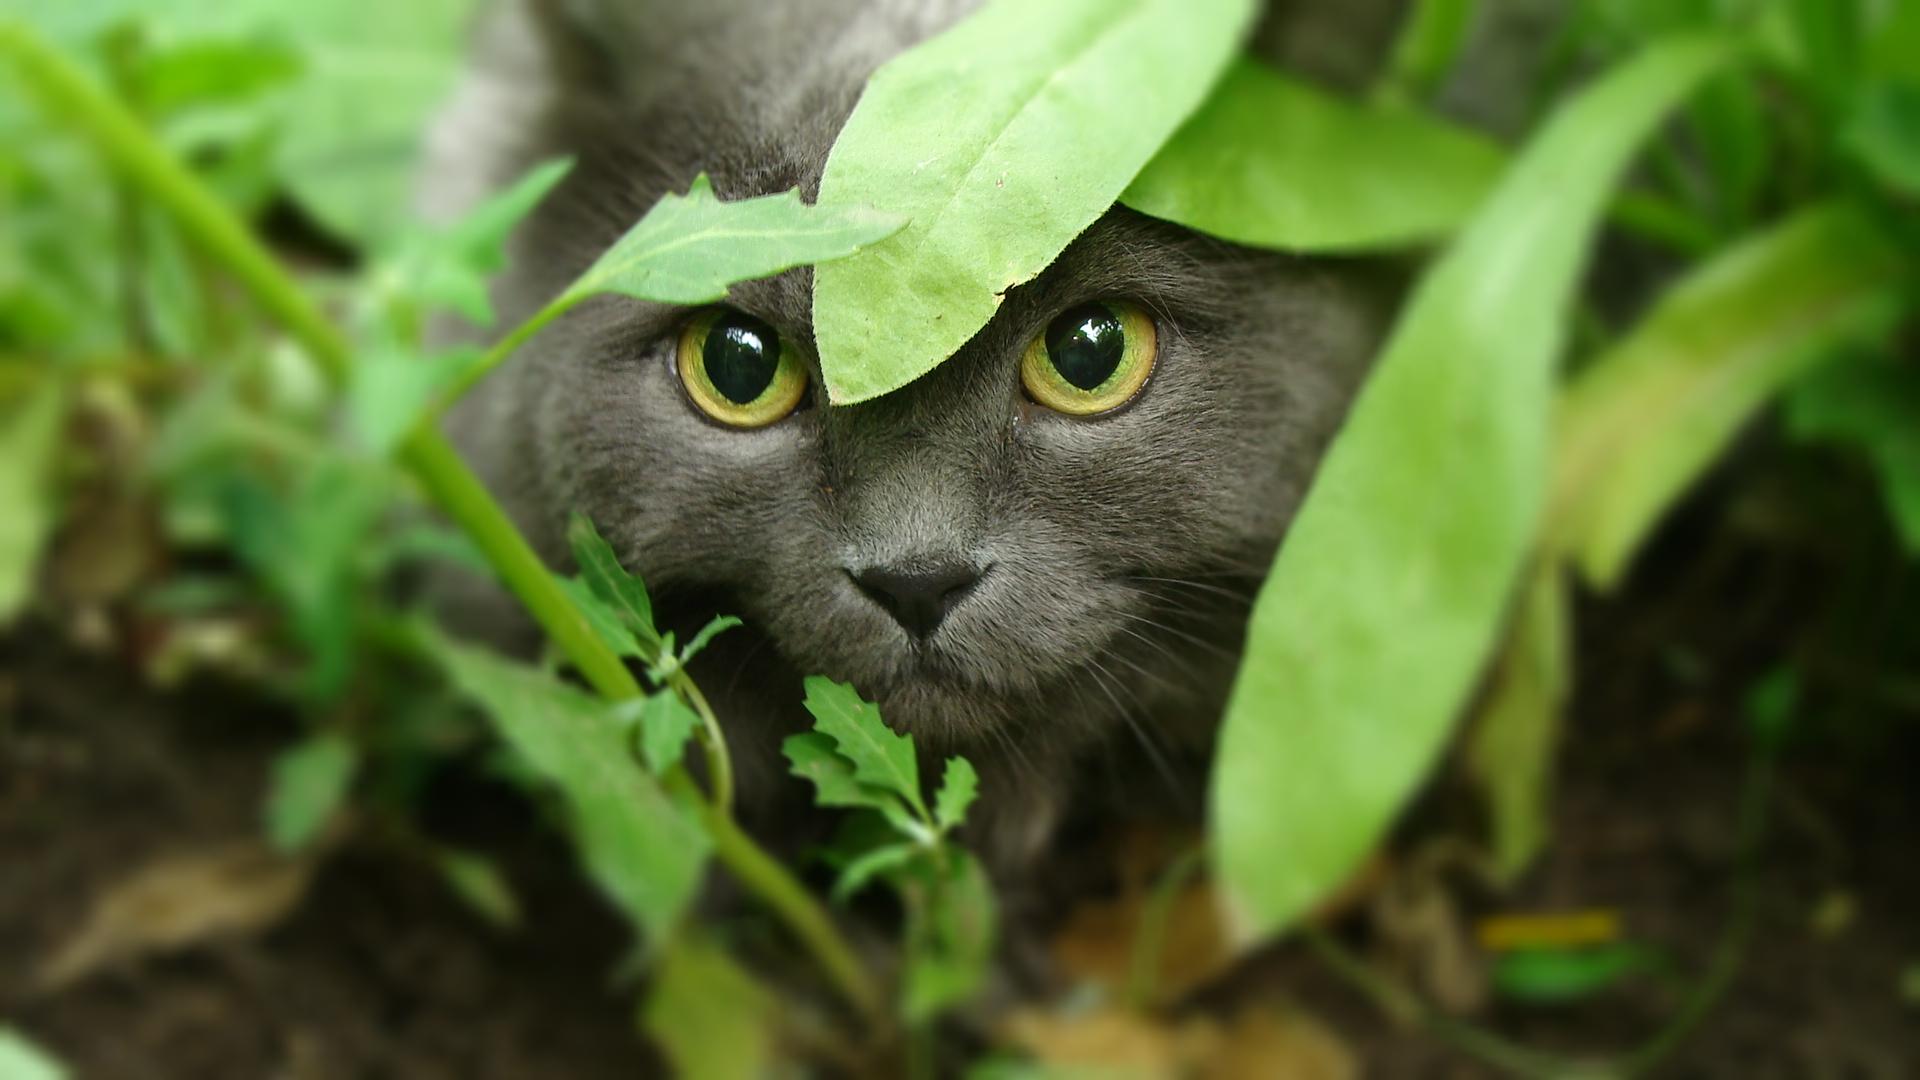 кот глаза зелень без регистрации